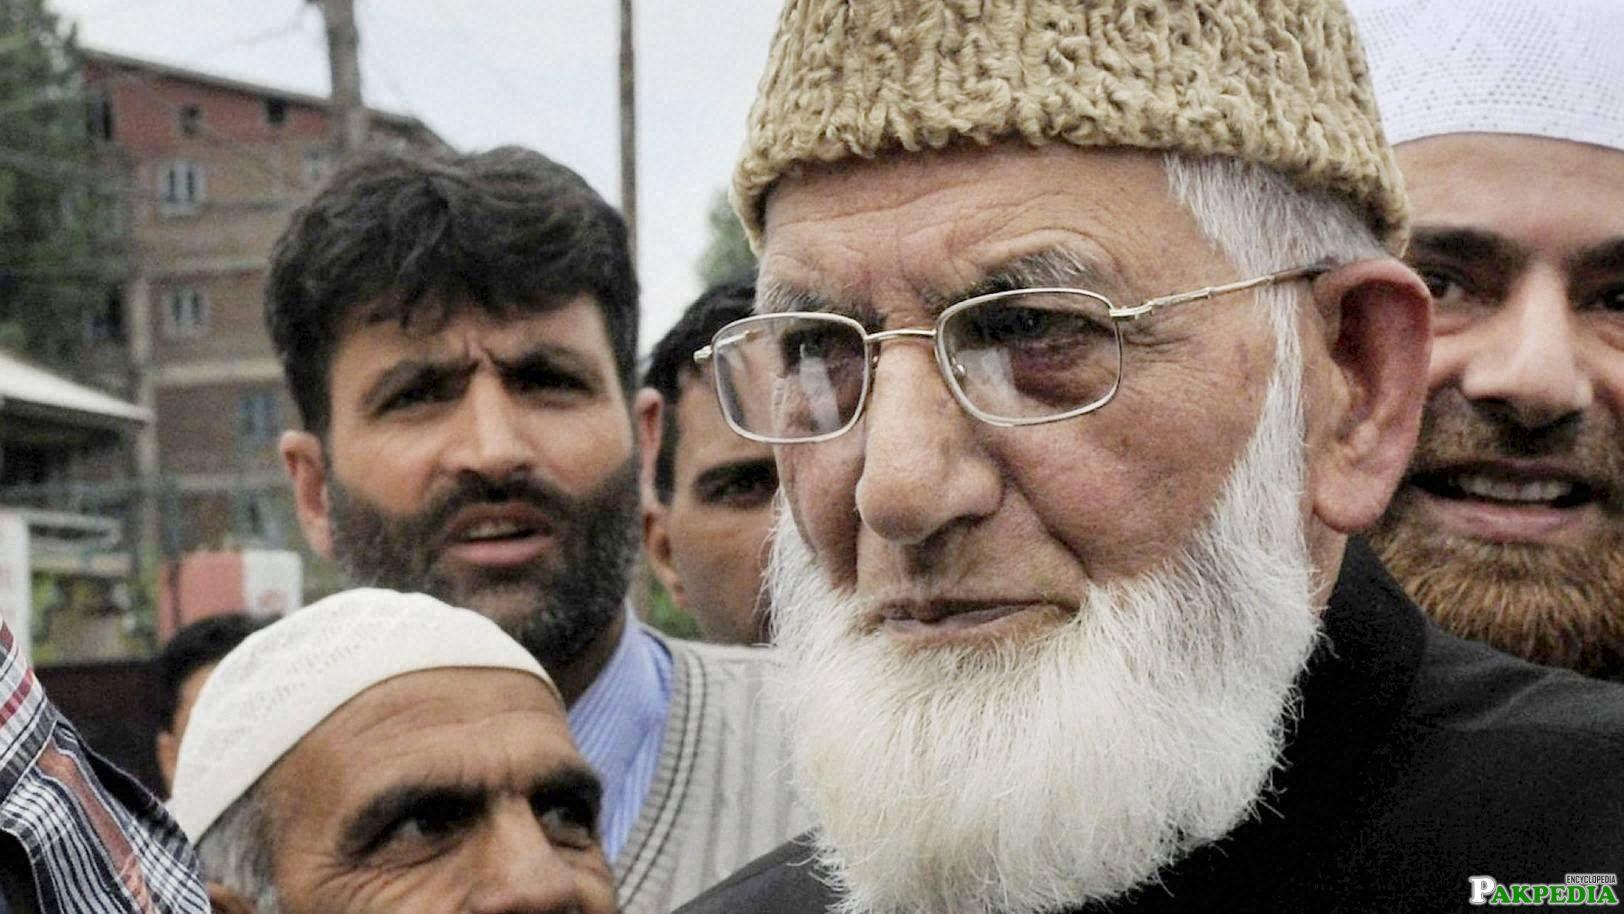 Syed Ali Shah Geelani member of Jamaat-e-Islami Kashmir